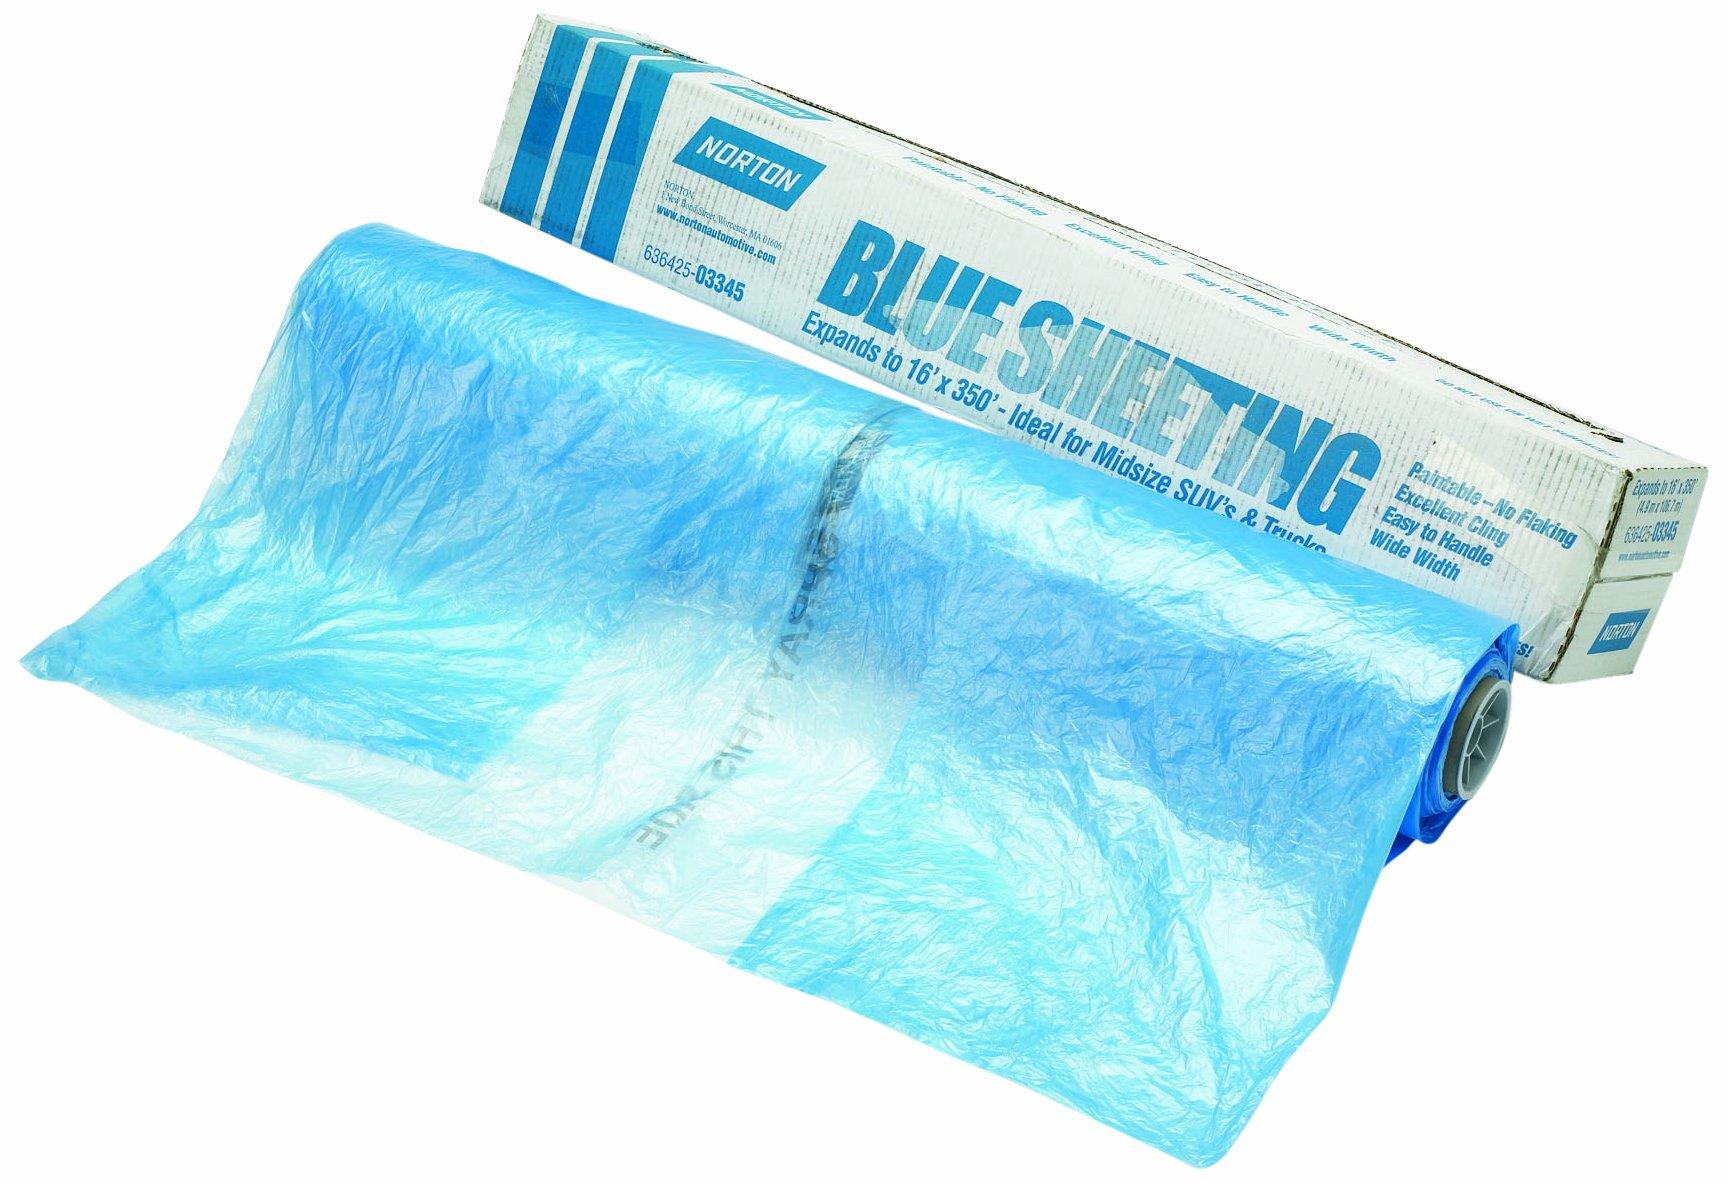 Norton 636425-03723 Blue 20' x 350' Sheeting